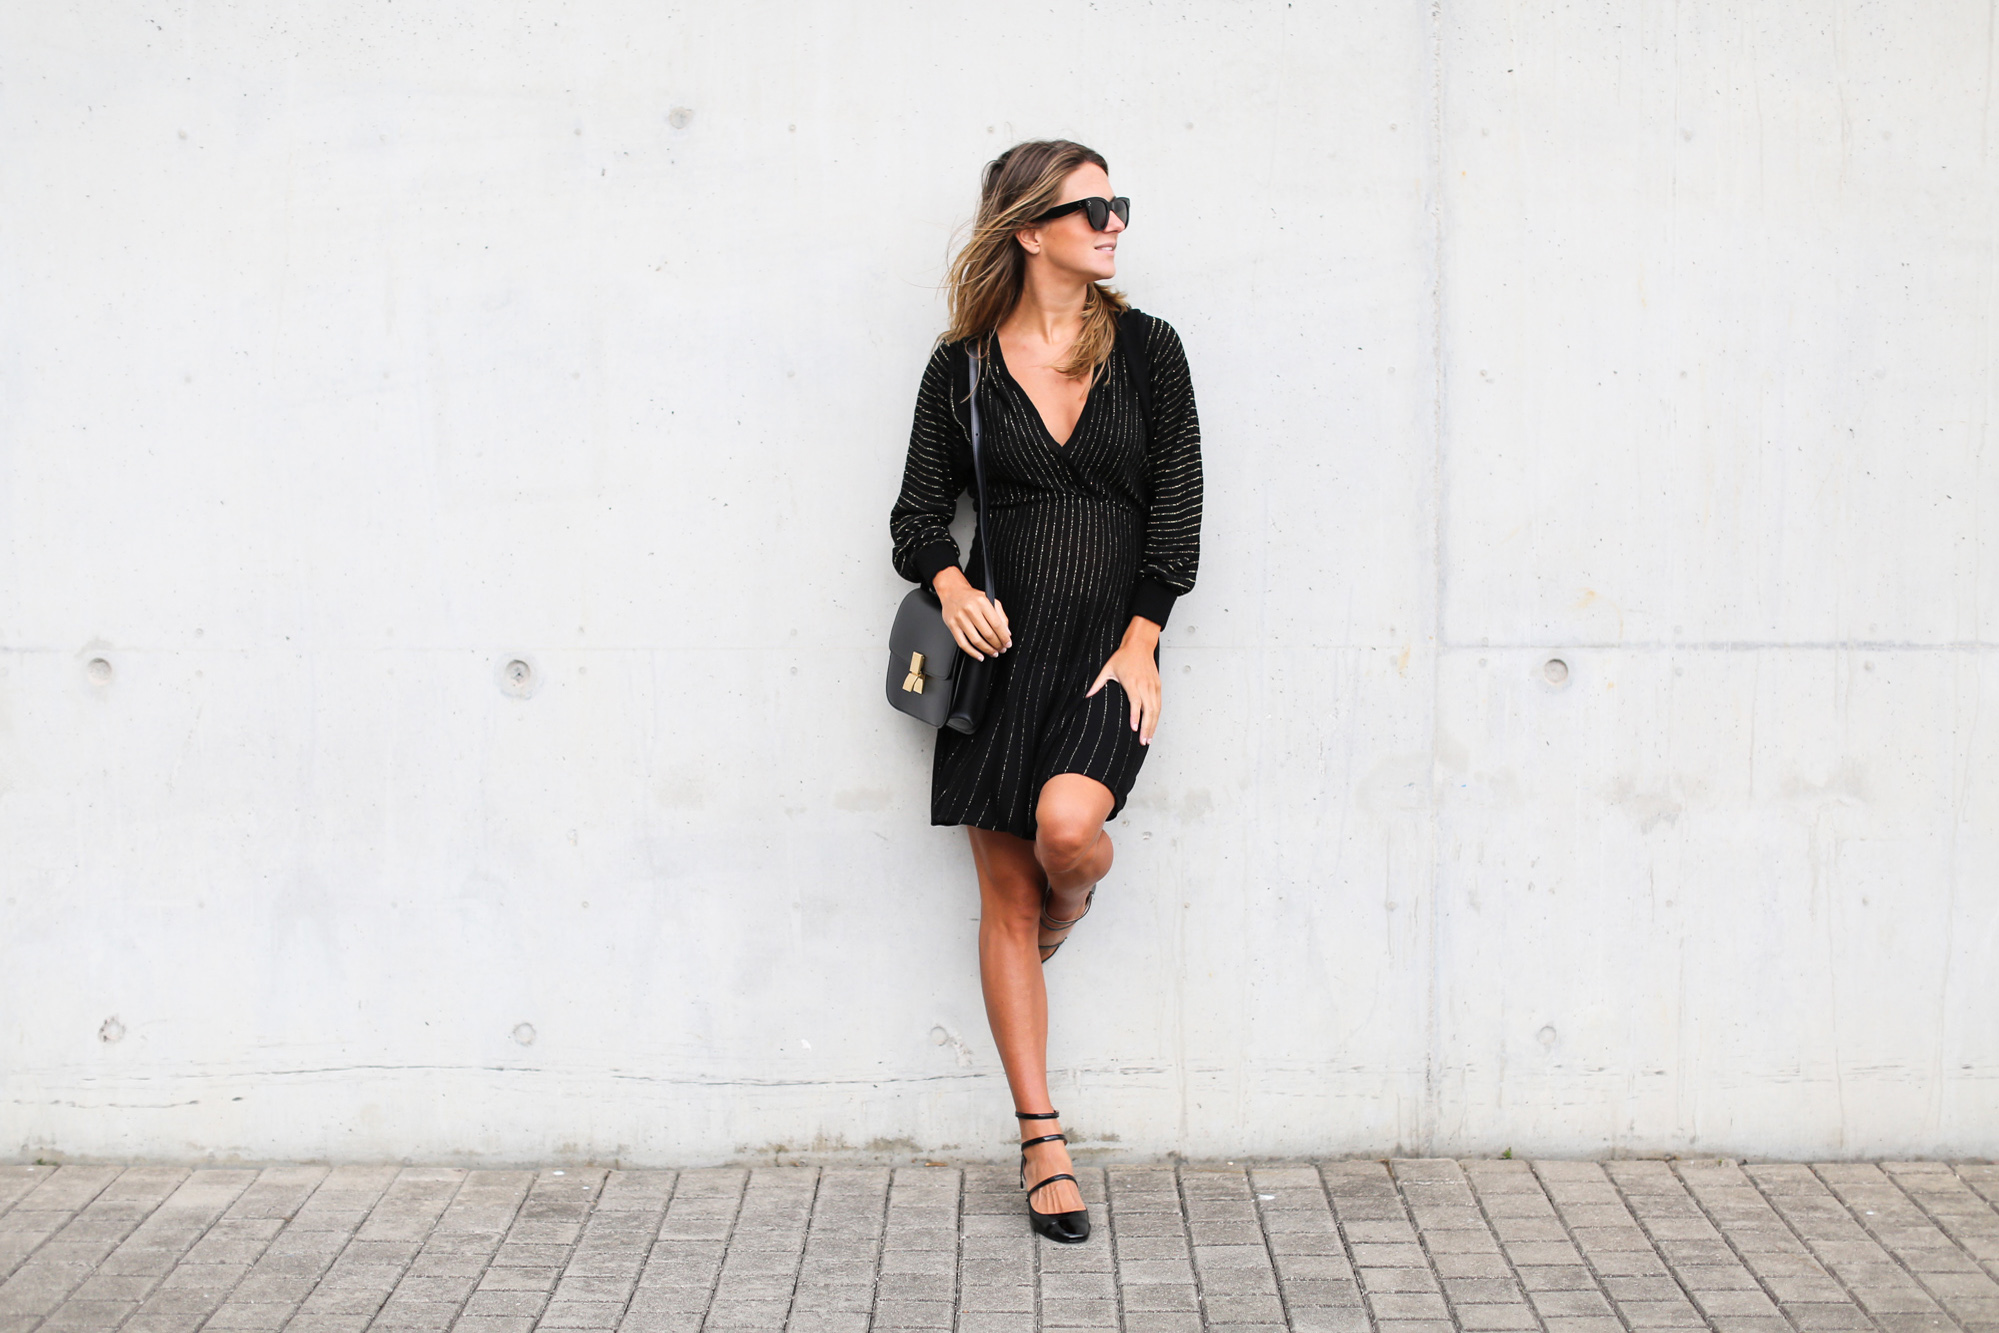 Clochet_streetstyle_fashionblogger_zaraknitdress_specialedition_celineboxbag_celinesunglasses-7